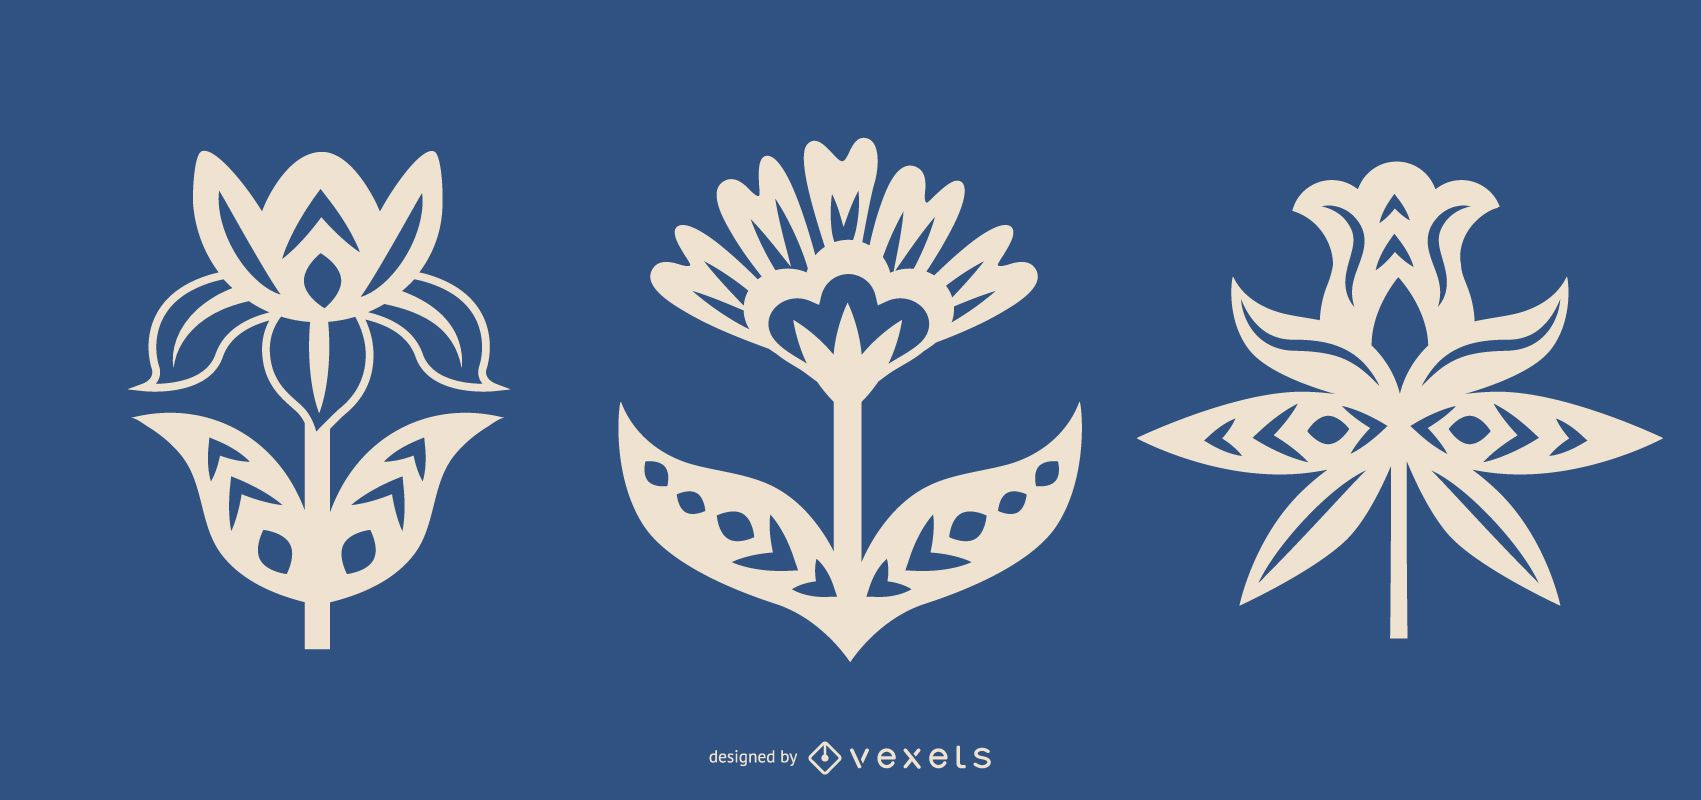 Flower silhouettes folk art set